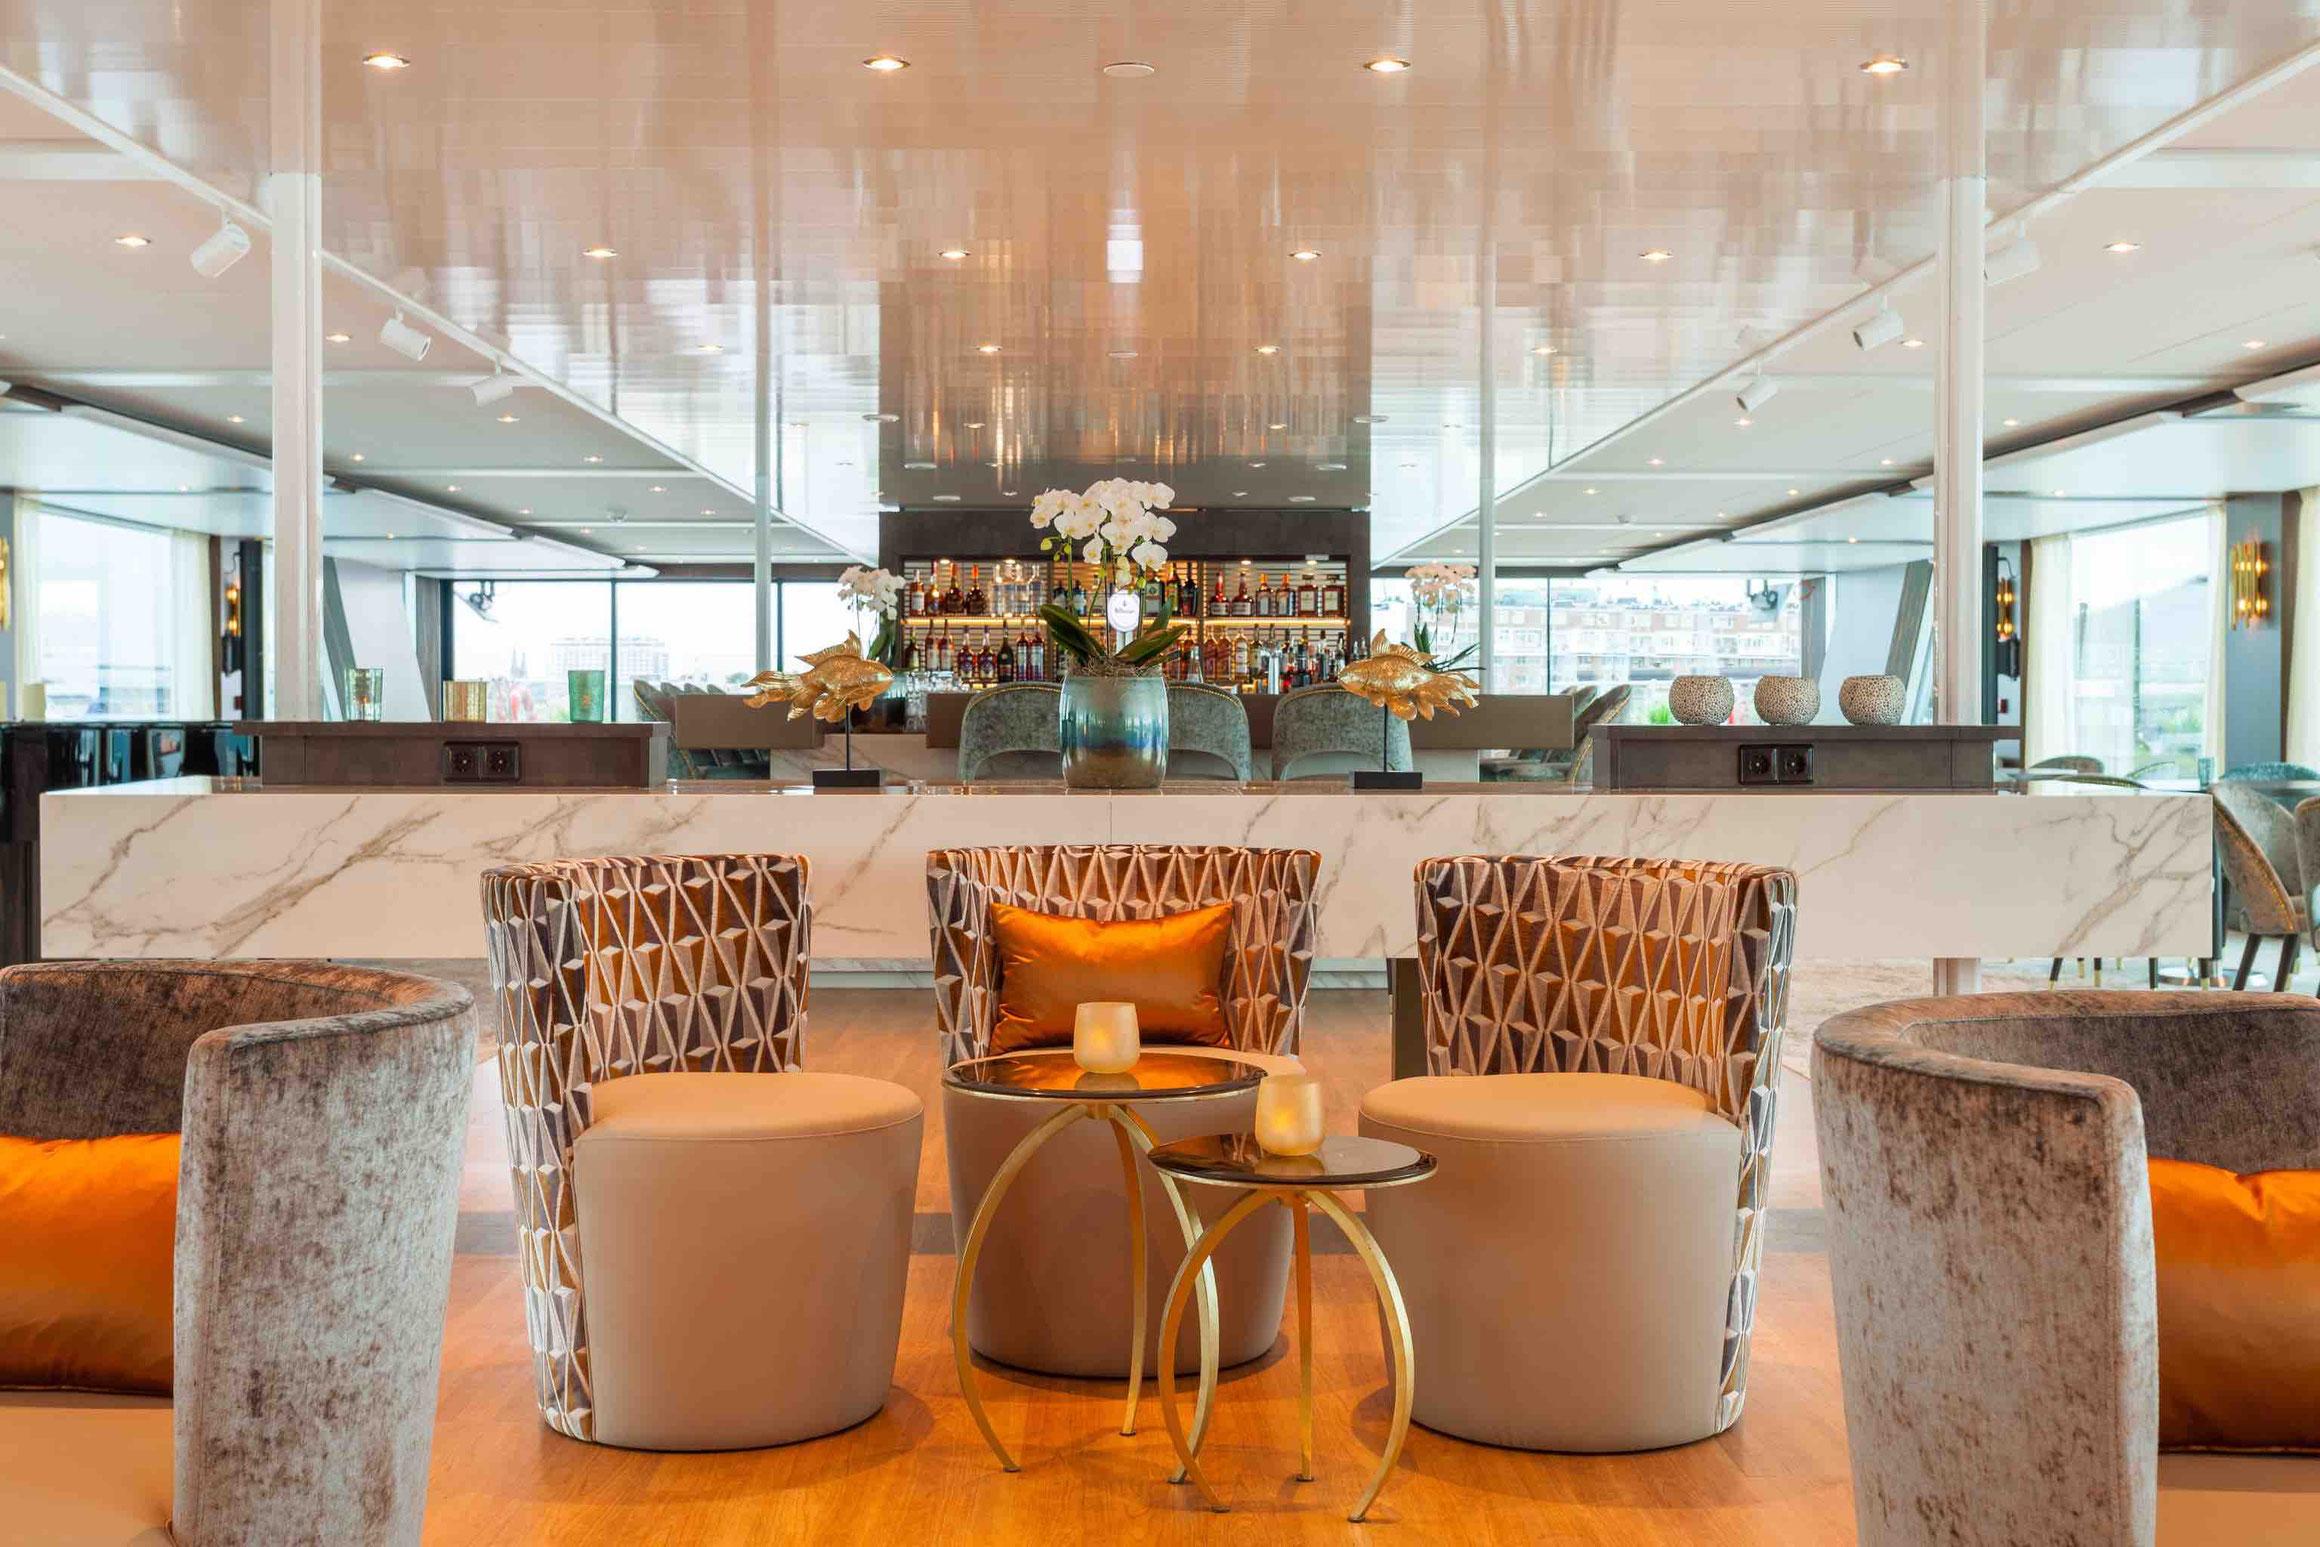 MS AMADEUS Imperial Panorama Lounge